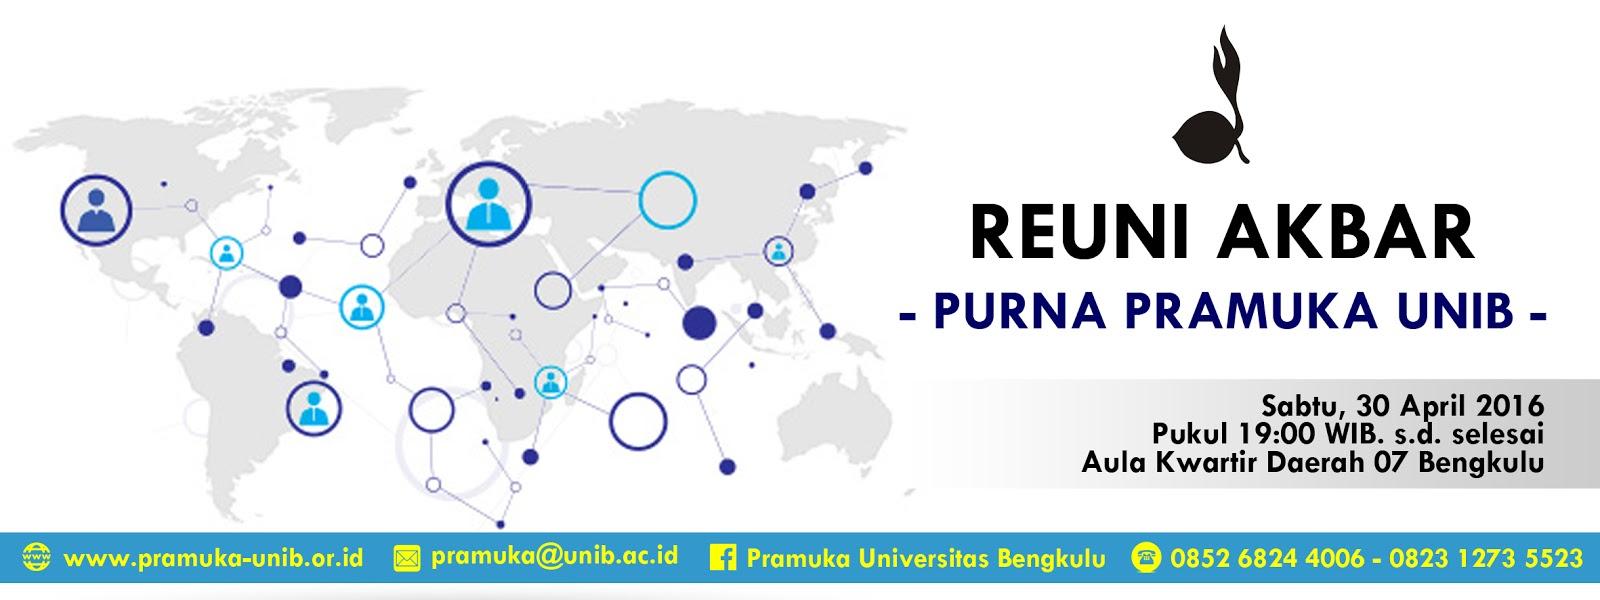 Undangan Reuni Akbar Purna Pramuka Universitas Bengkulu Pramuka